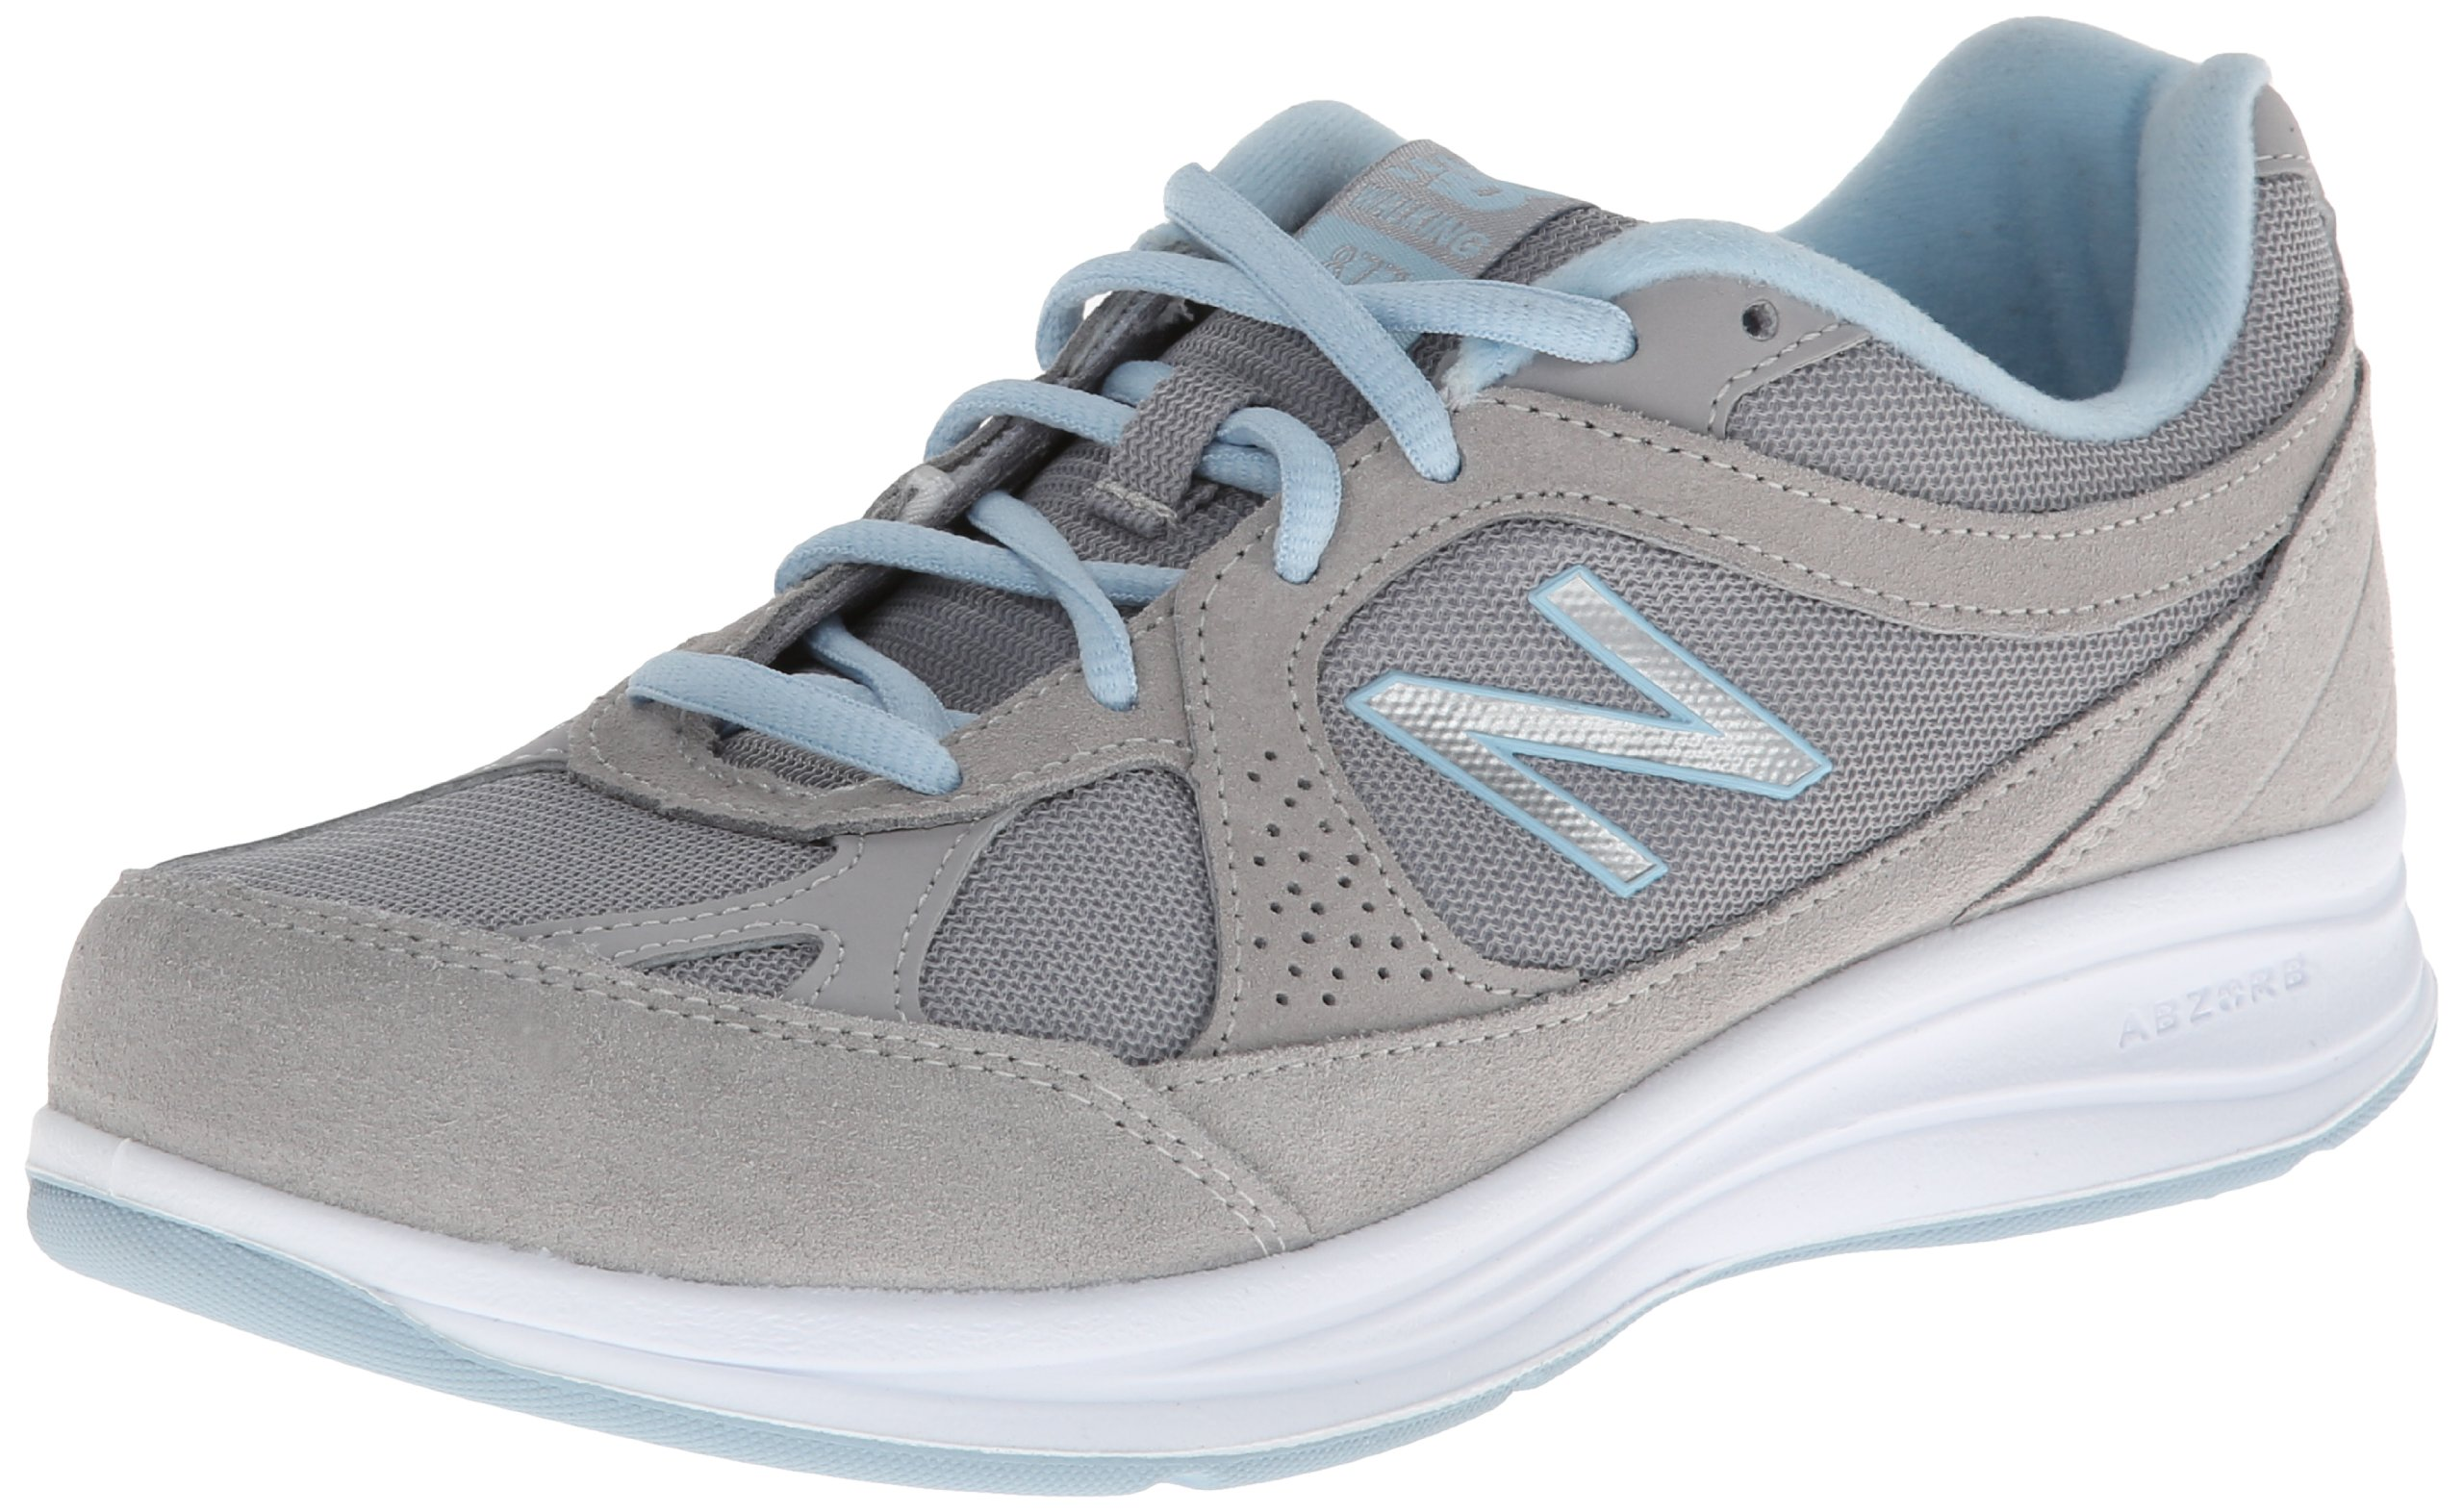 New Balance Women's WW877 Walking Shoe, Silver, 9 B US by New Balance